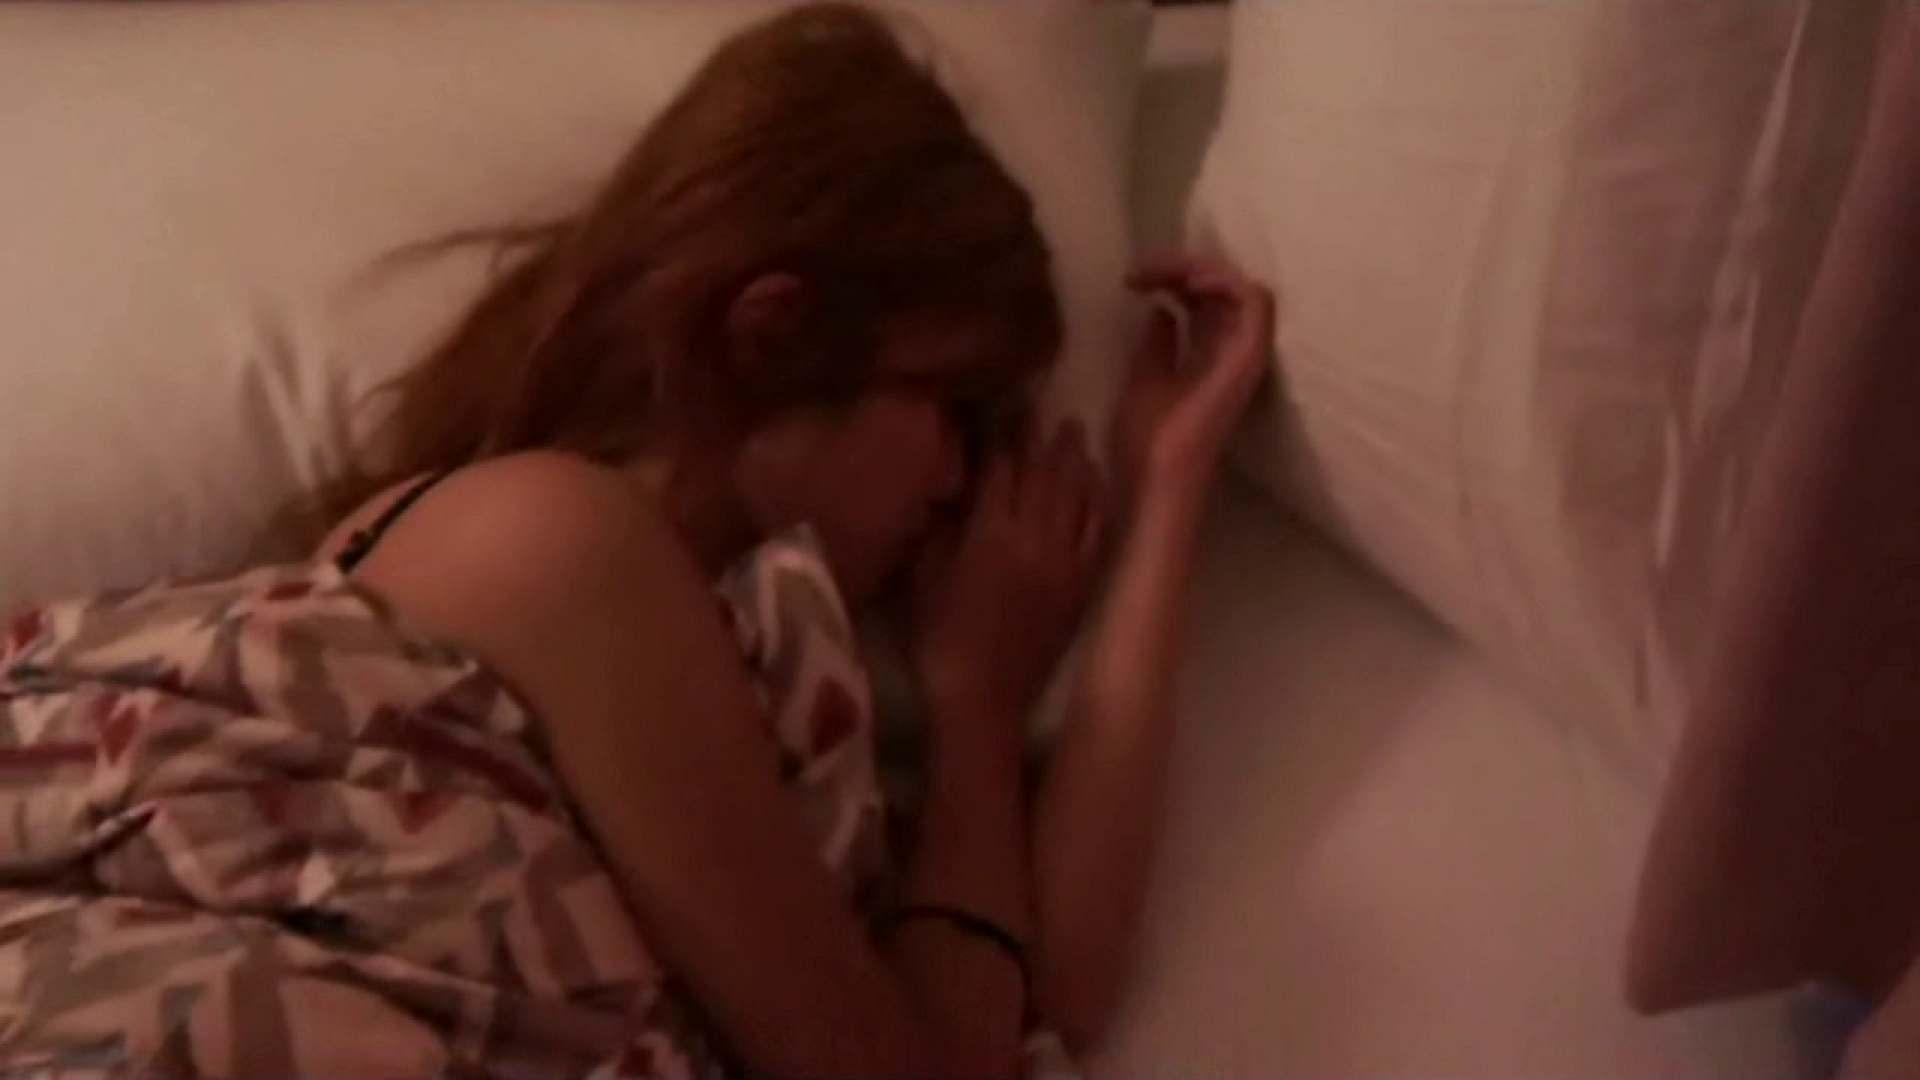 vol.2 【Yちゃん】当時女子大生 帰省した夏の夜 キャバ嬢 AV無料動画キャプチャ 110画像 63